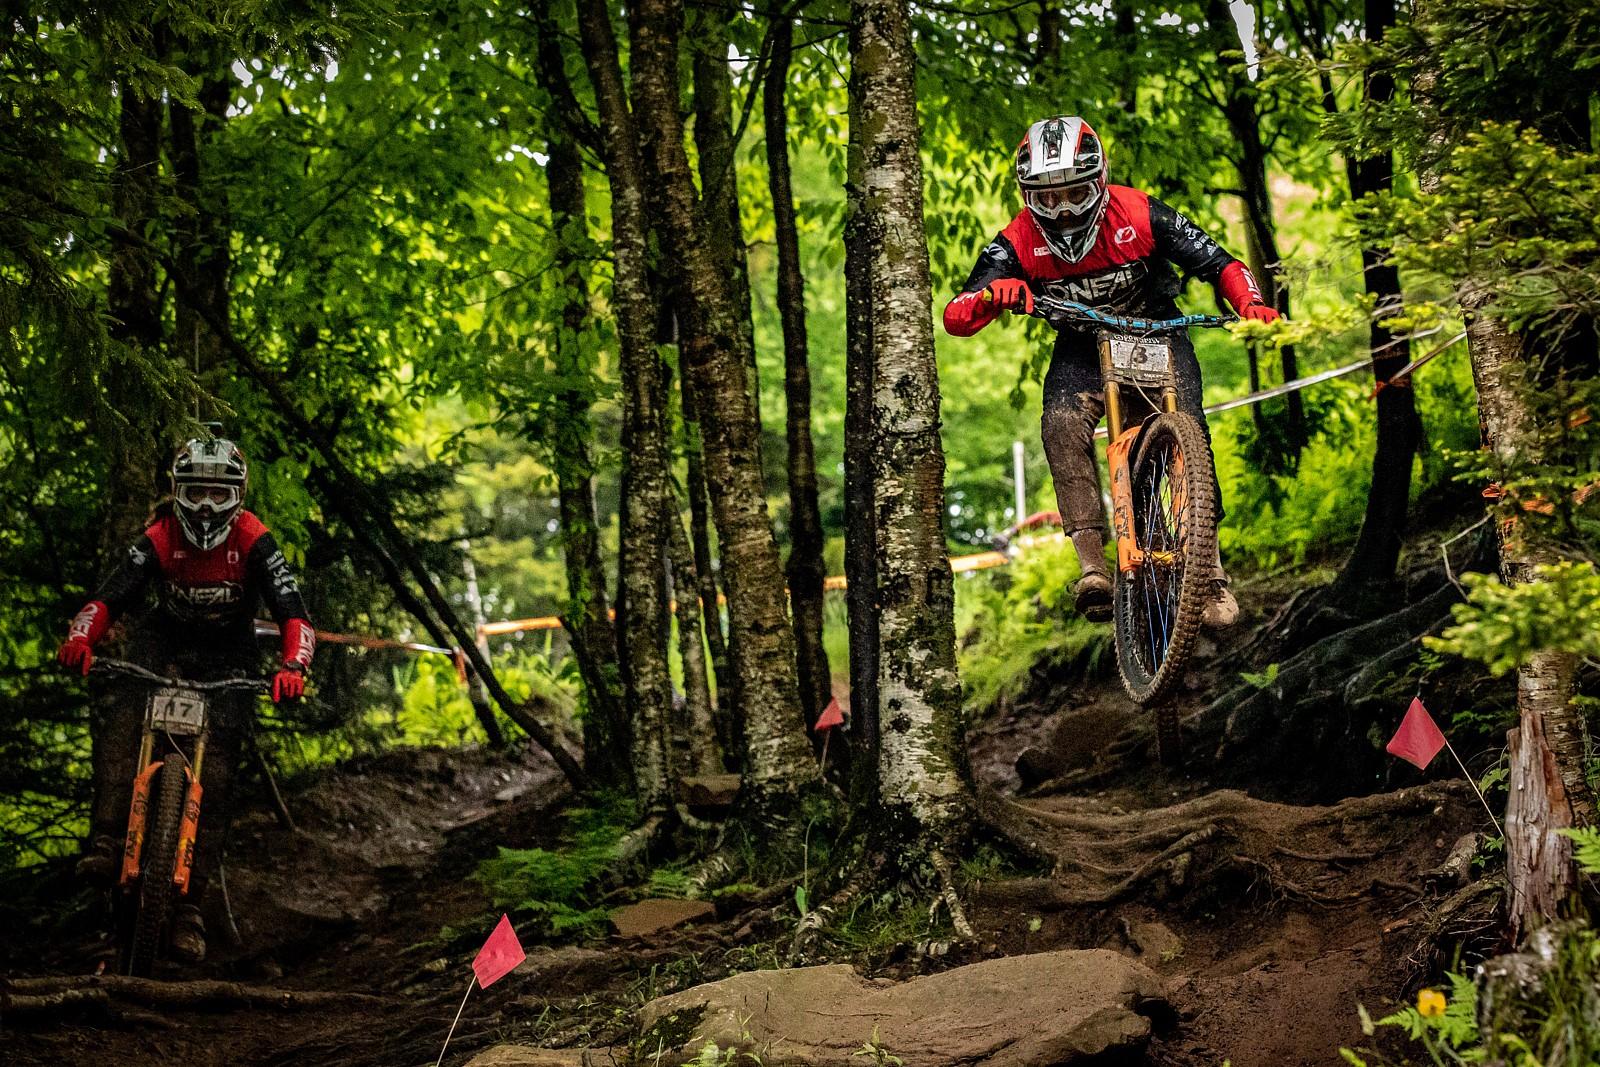 RACE REPORT - DHSE #2 Snowshoe, WV - JackRice - Mountain Biking Pictures - Vital MTB